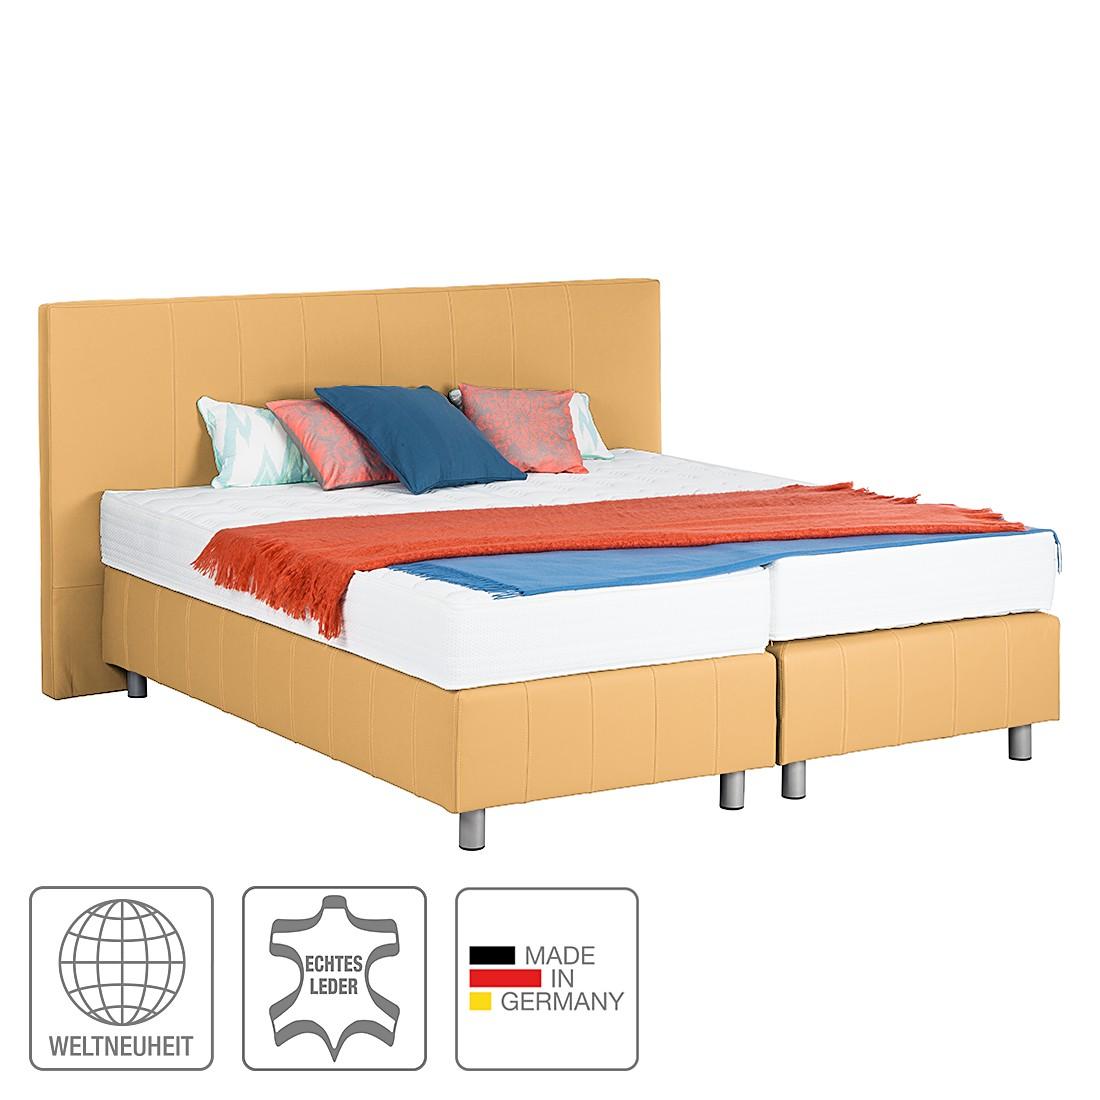 Boxspringbett Atlanta (Echtleder) - Ohne Topper - 200 x 200cm - H3 ab 80 kg - Gelb, Art of Sleep